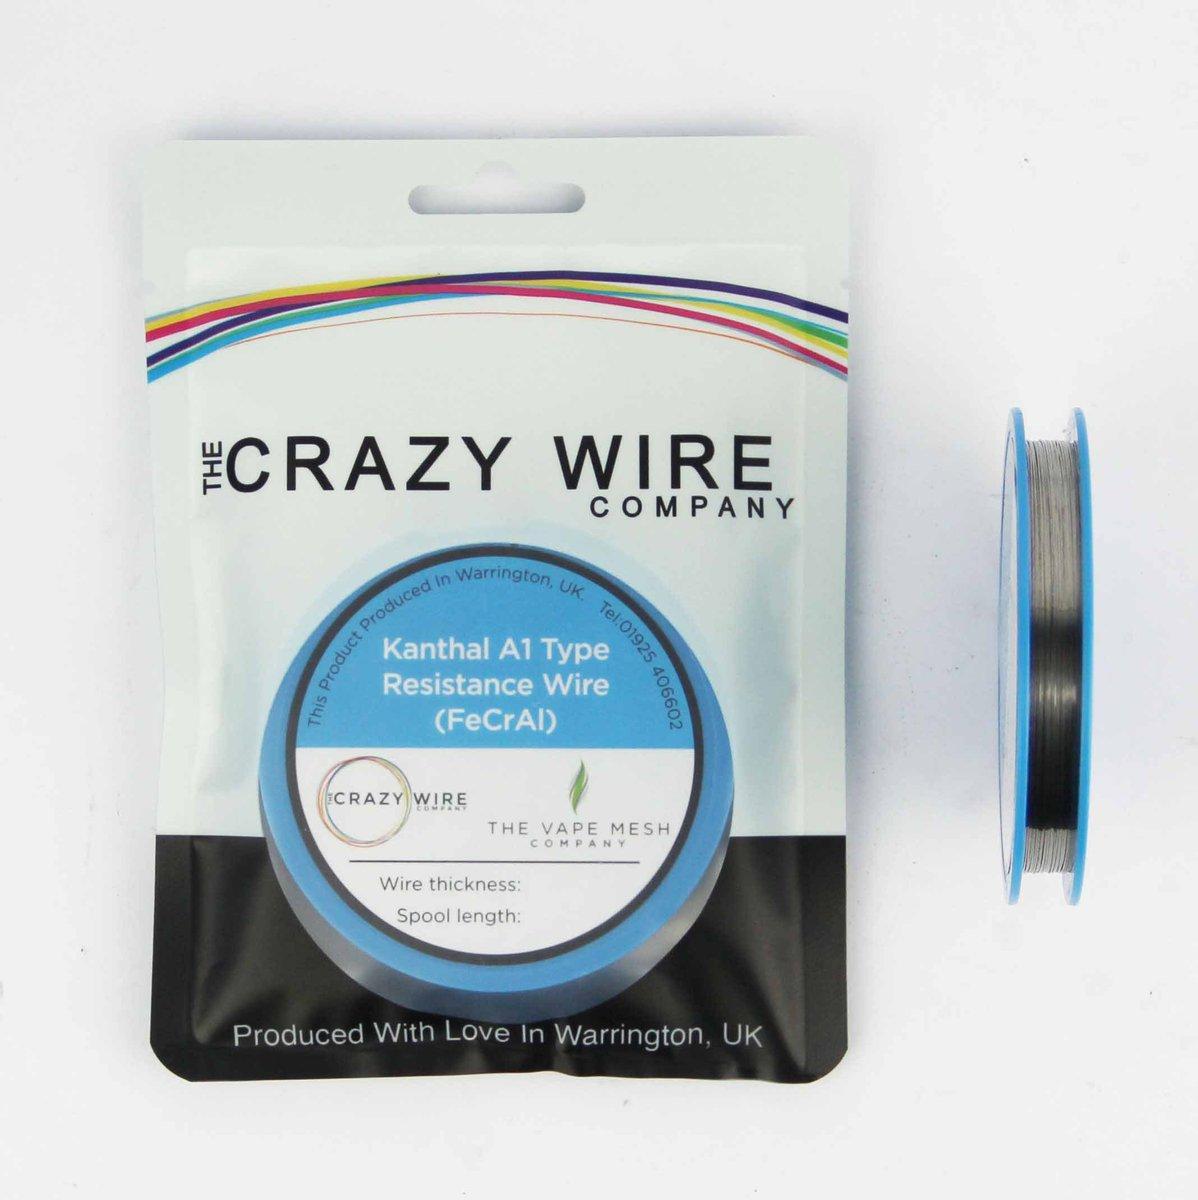 Crazy Wire Company (@CrazyWireCo) | Twitter